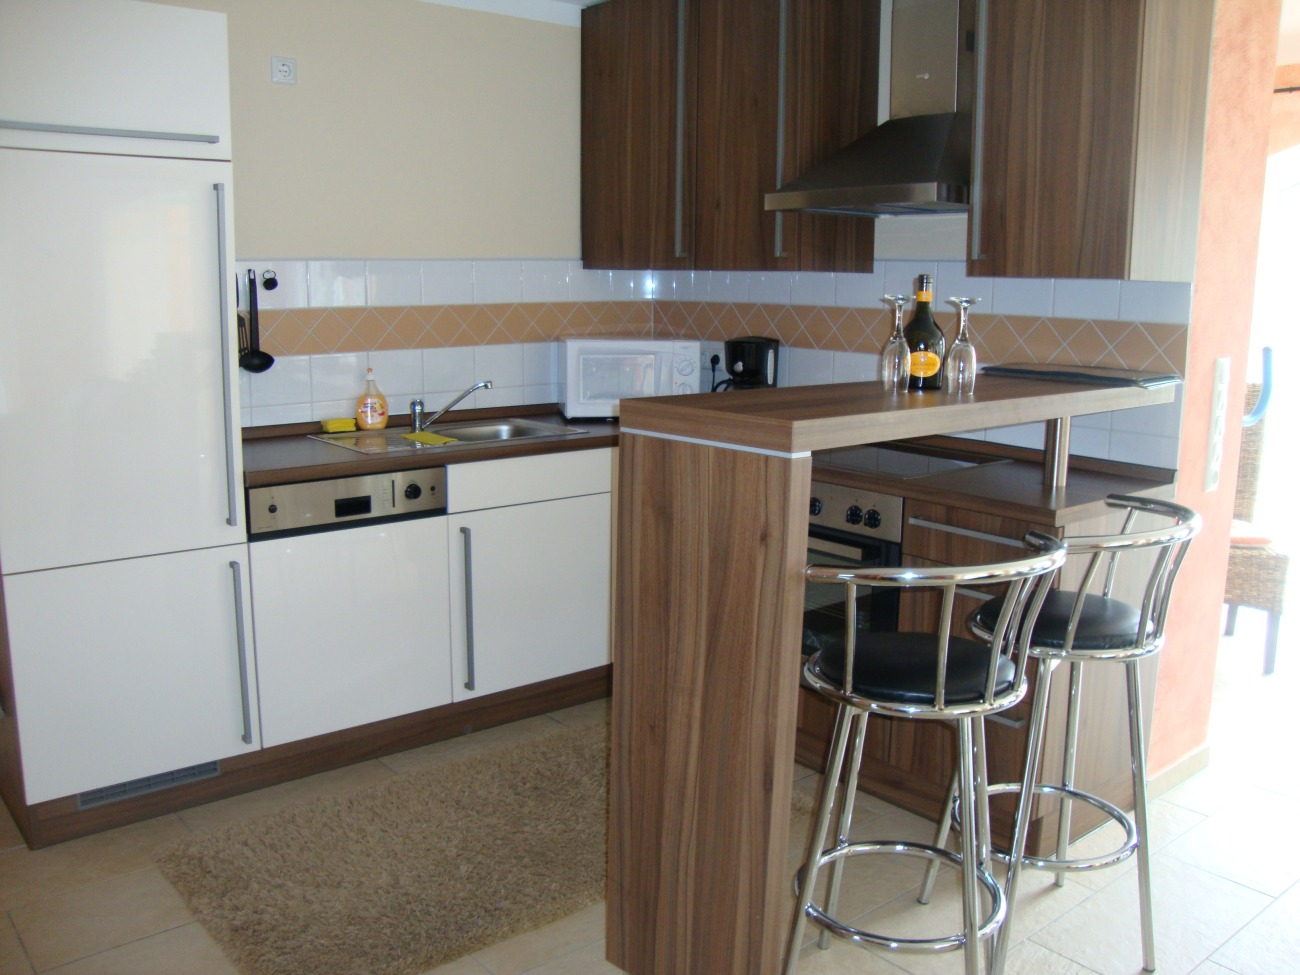 Ferienvilla-Seenland_Apartment-Toscana-EG_01